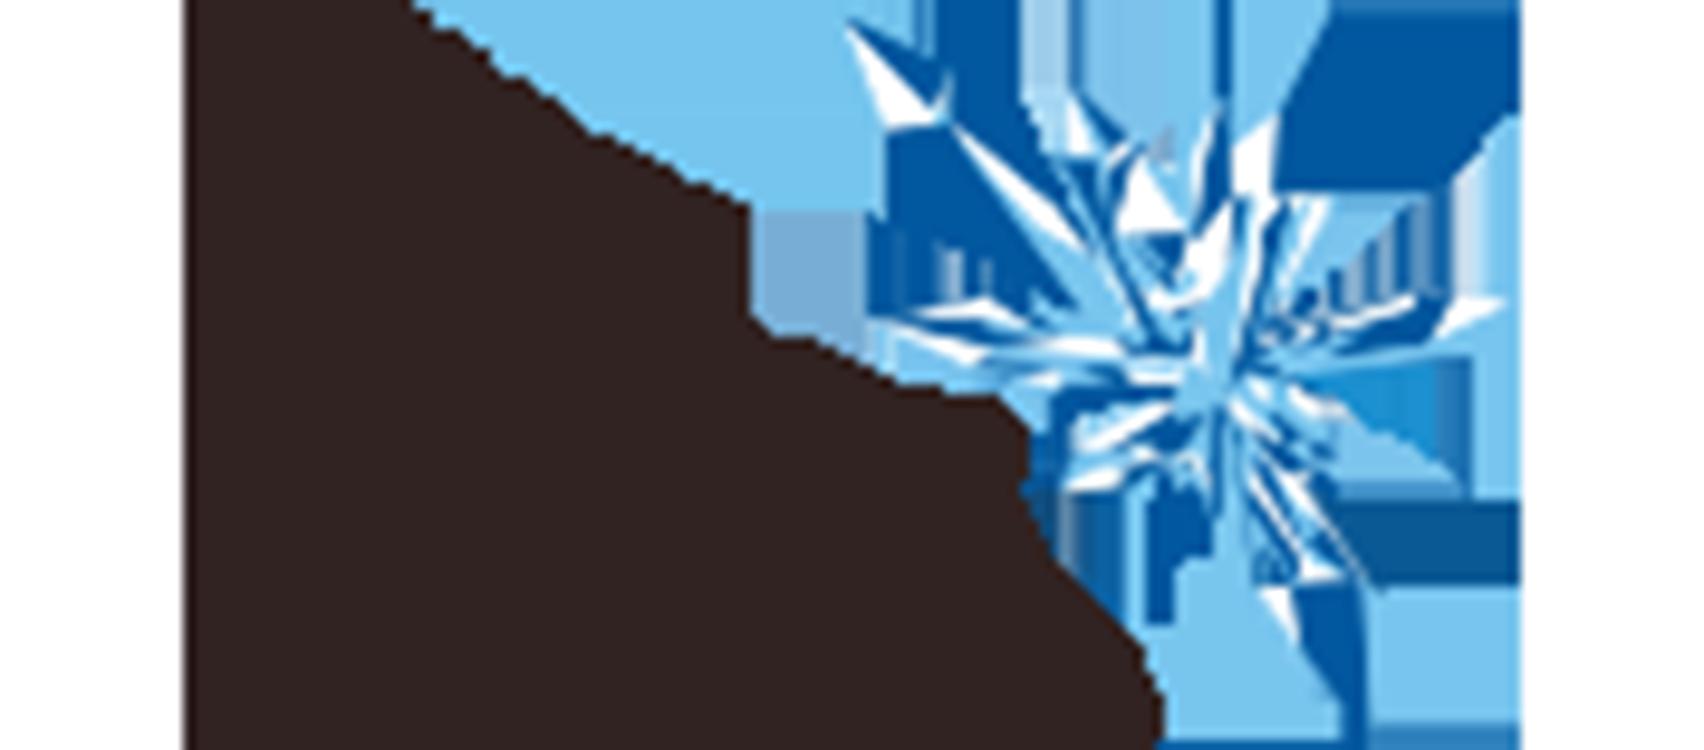 Кристалл Телеком